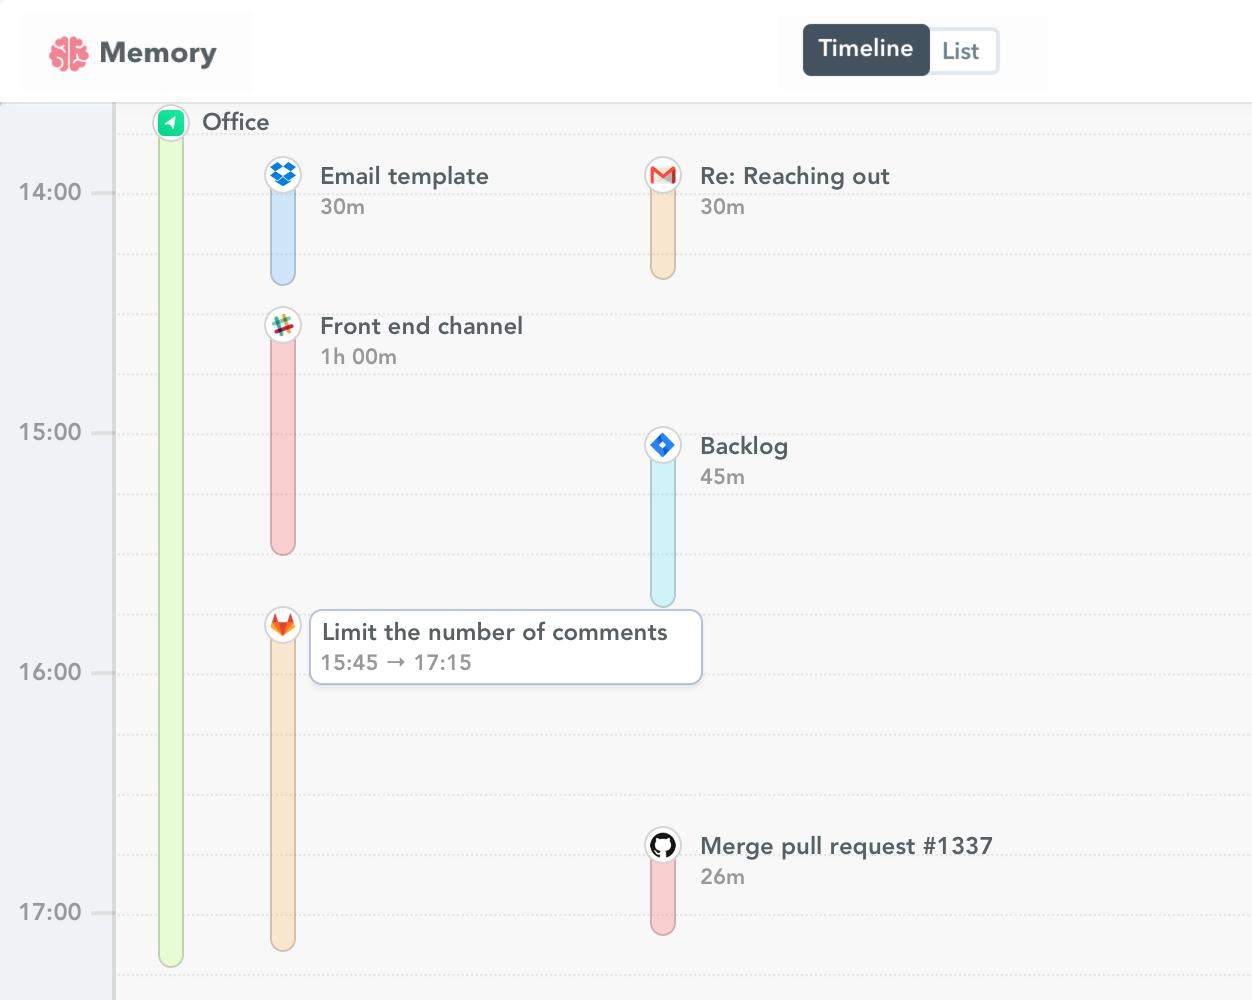 Gitlab time tracking 2x